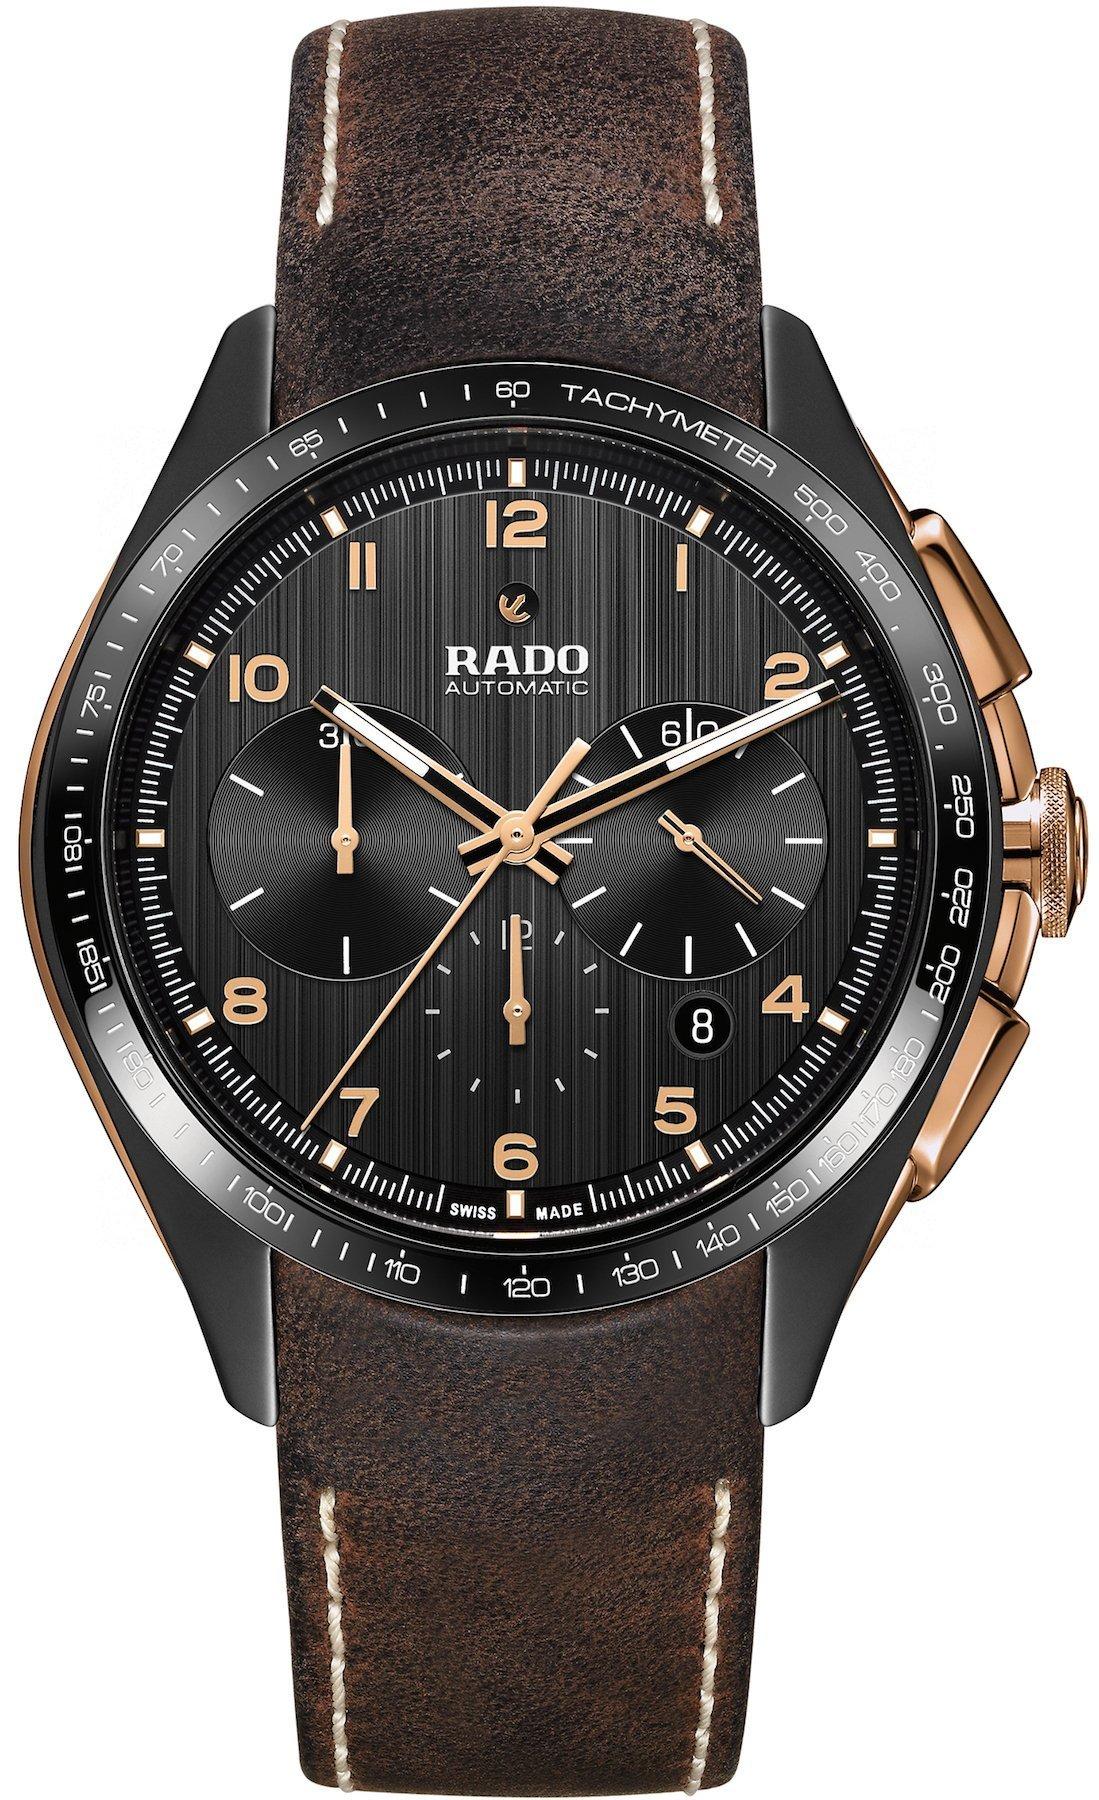 Rado HyperChrome Chronograph Limited Edition Men's Watch